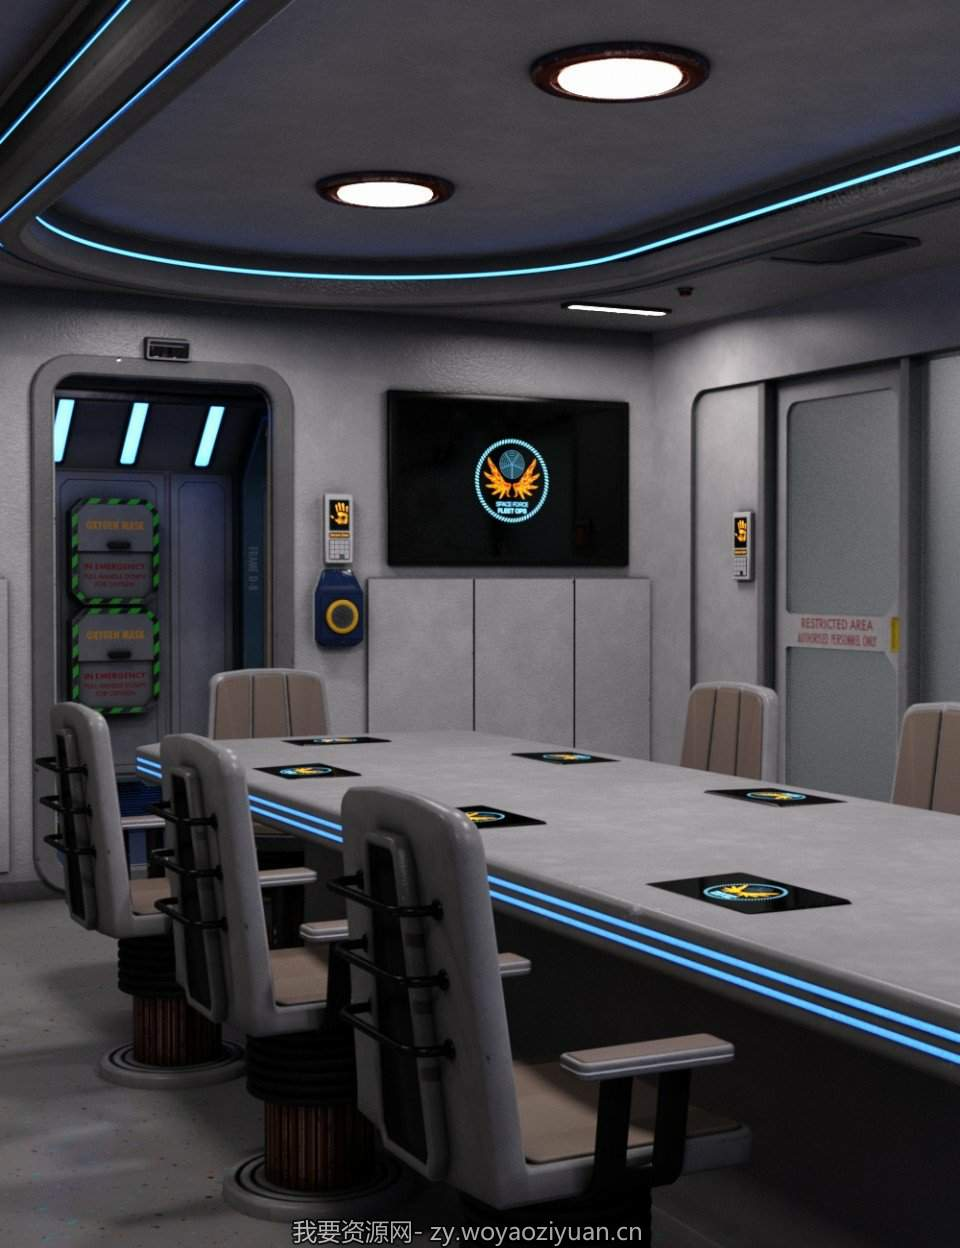 Fleet Ops Admiral's Ready Room